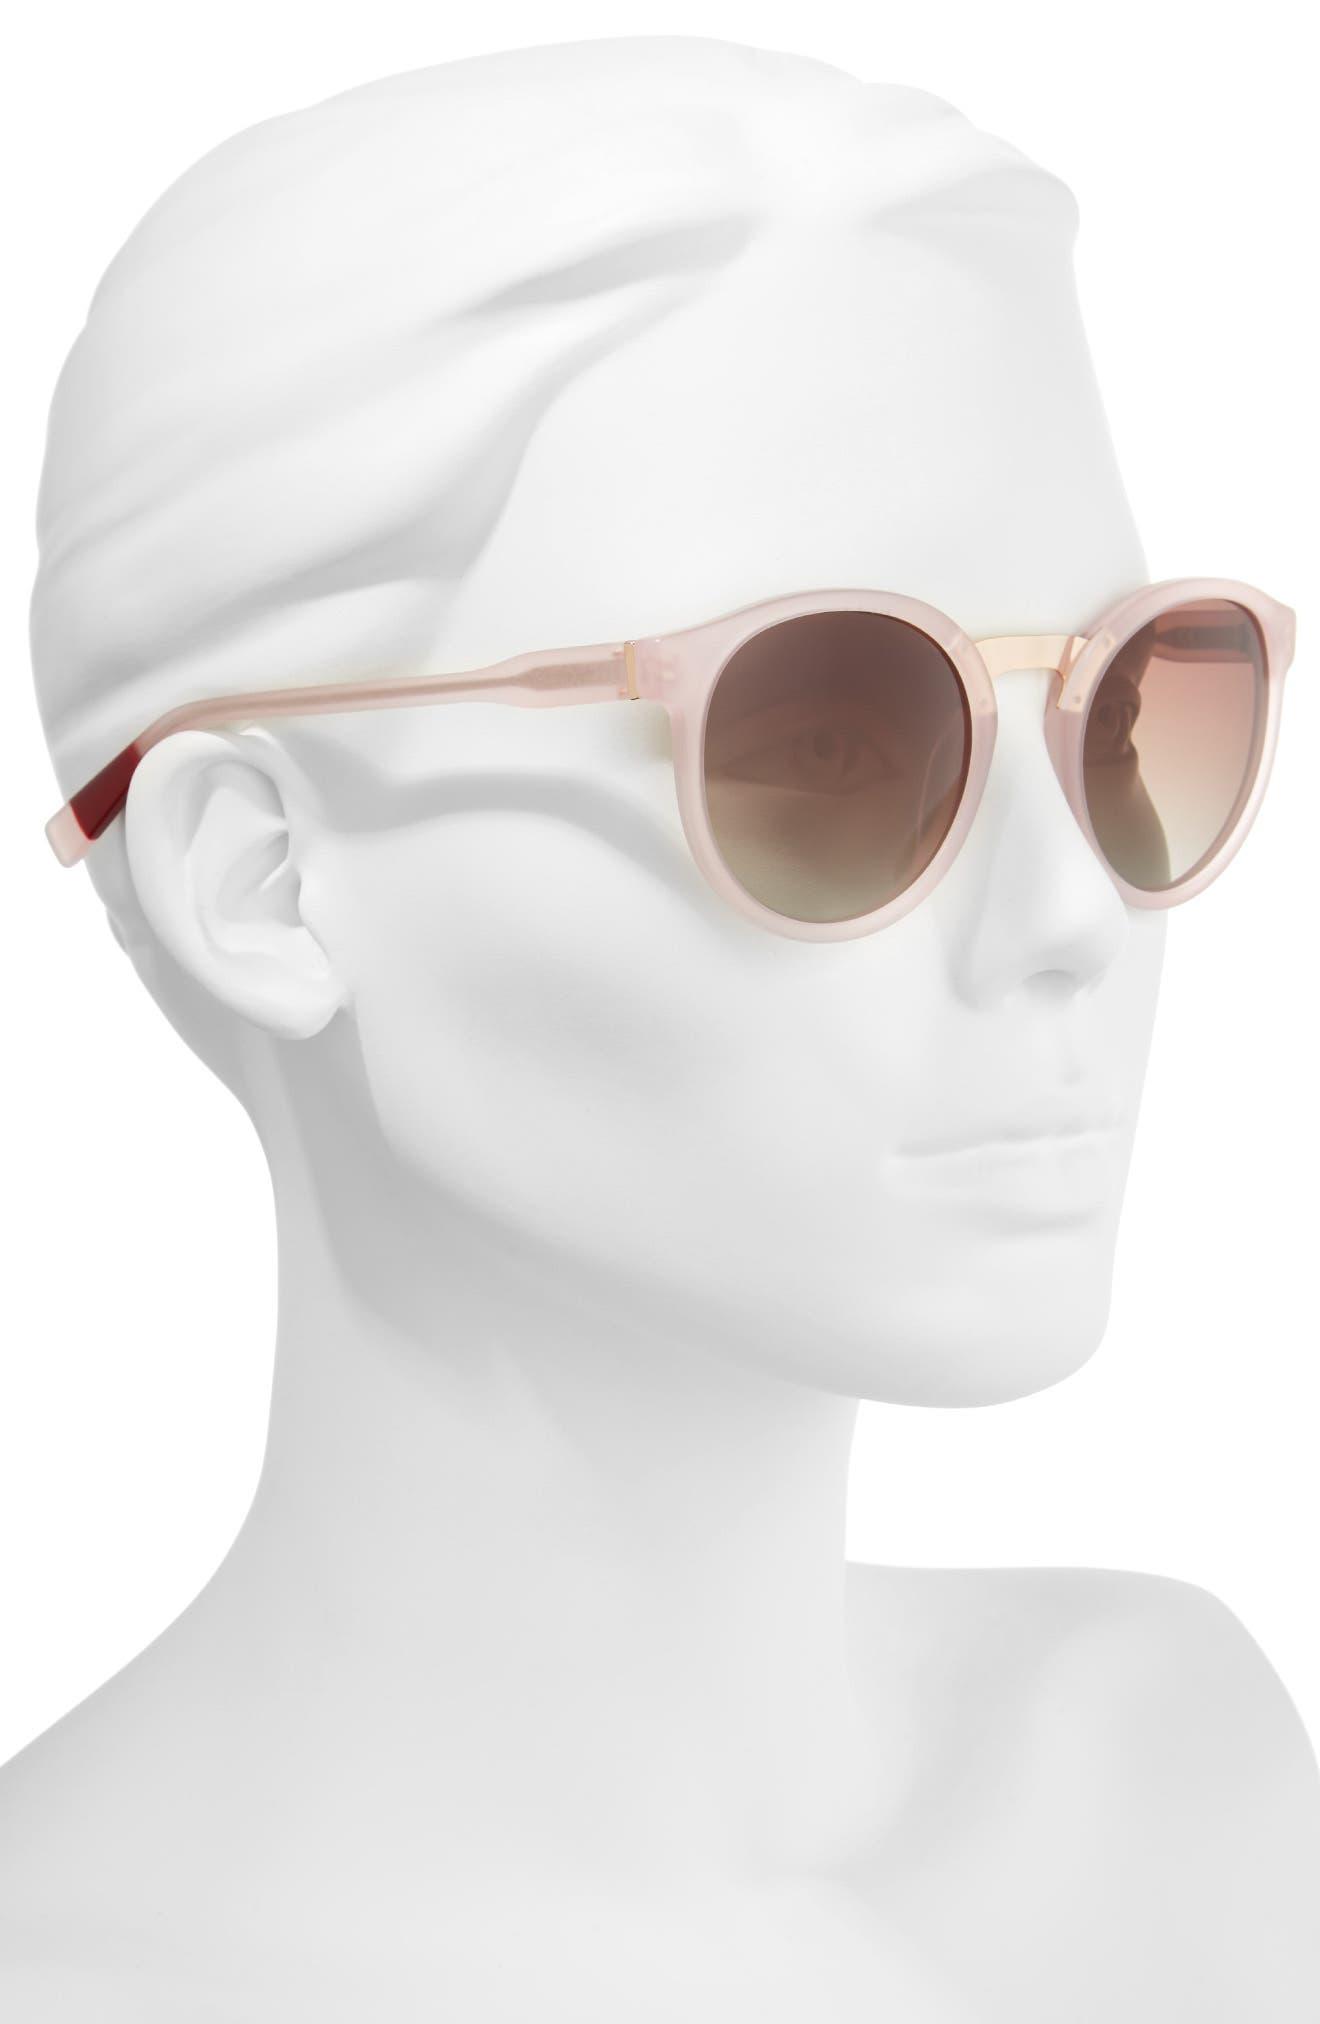 53mm Round Sunglasses,                             Alternate thumbnail 8, color,